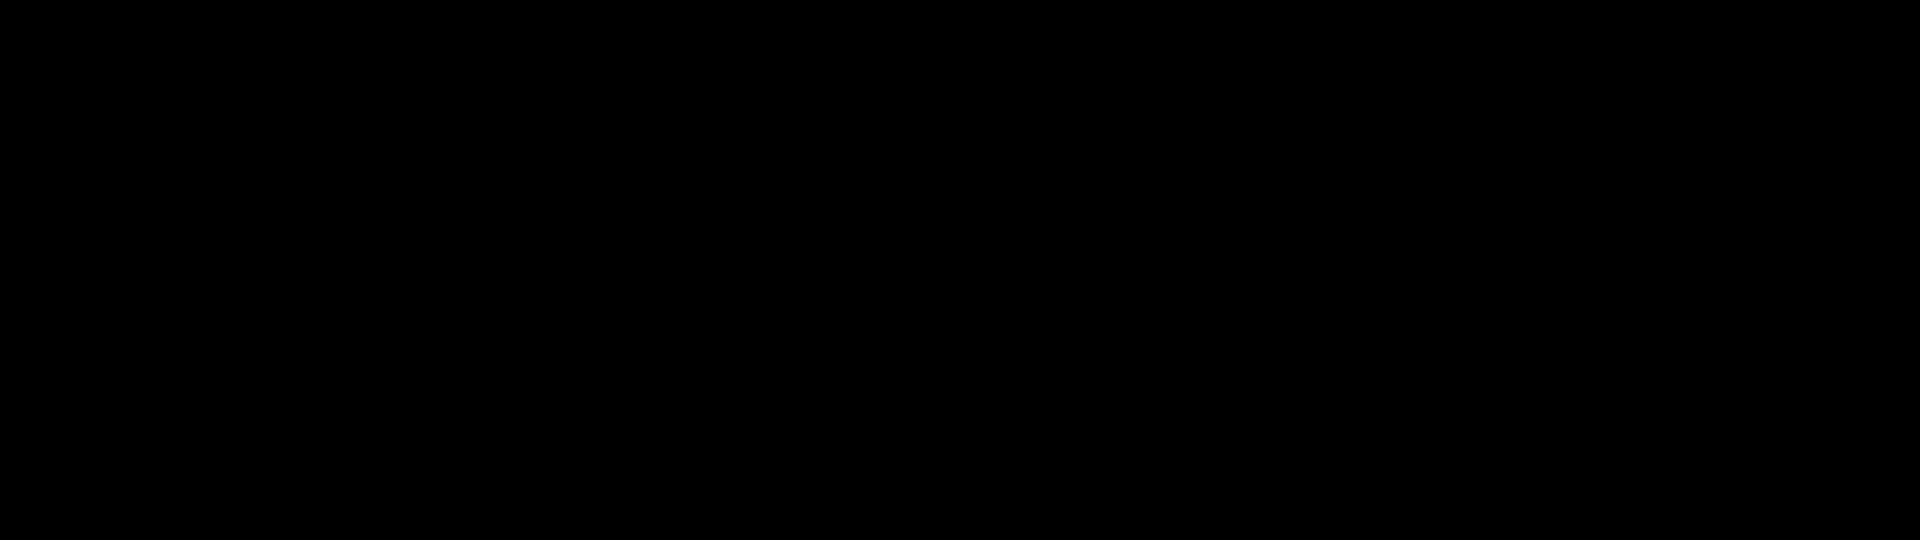 Holzhauer Slide 0 Licht